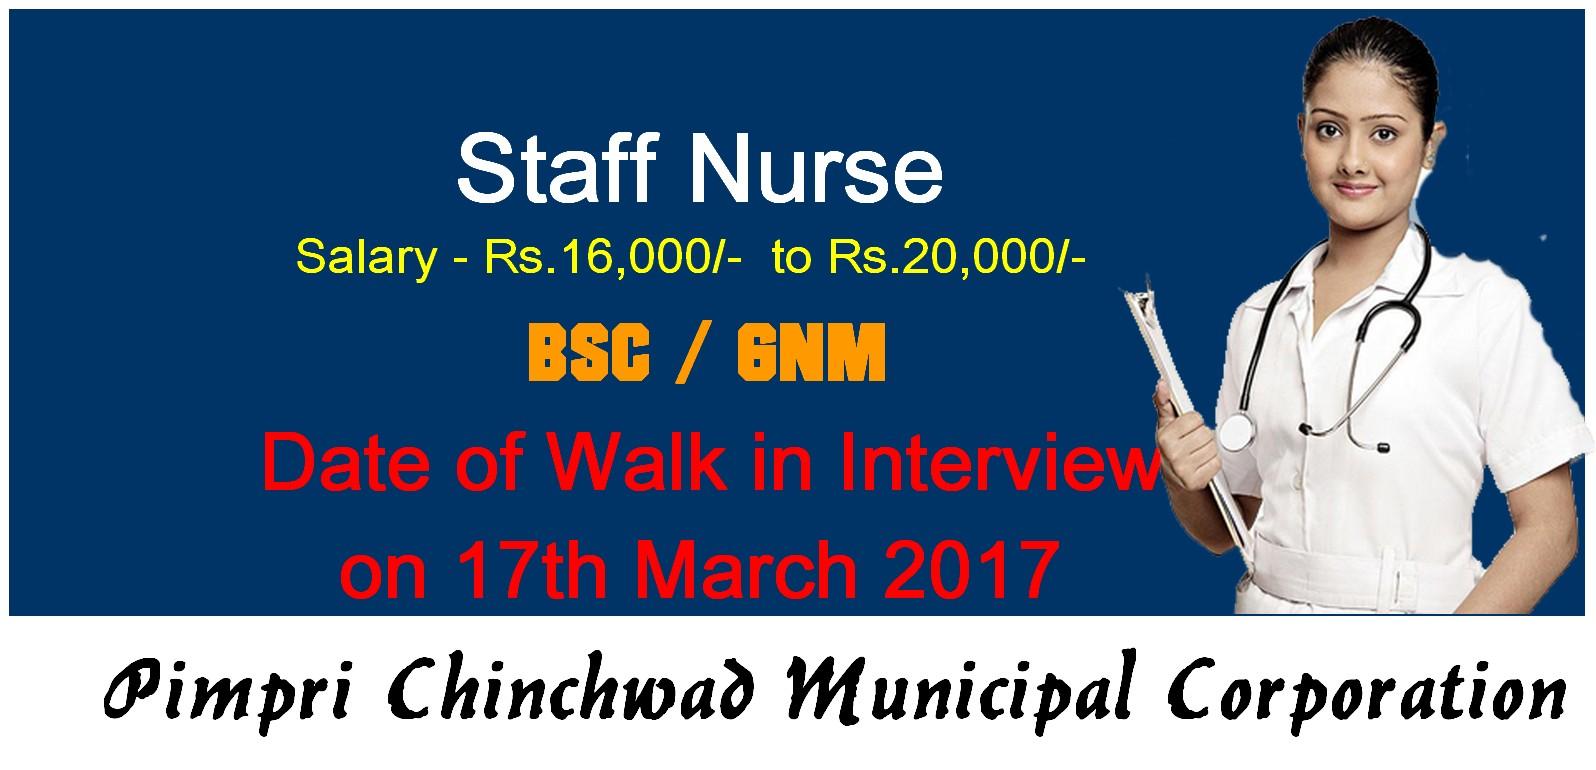 nurses job vacancy pimpri chinchwad municipal corporation staff pimpri chinchwad municipal corporation staff nurse recruitment 2017